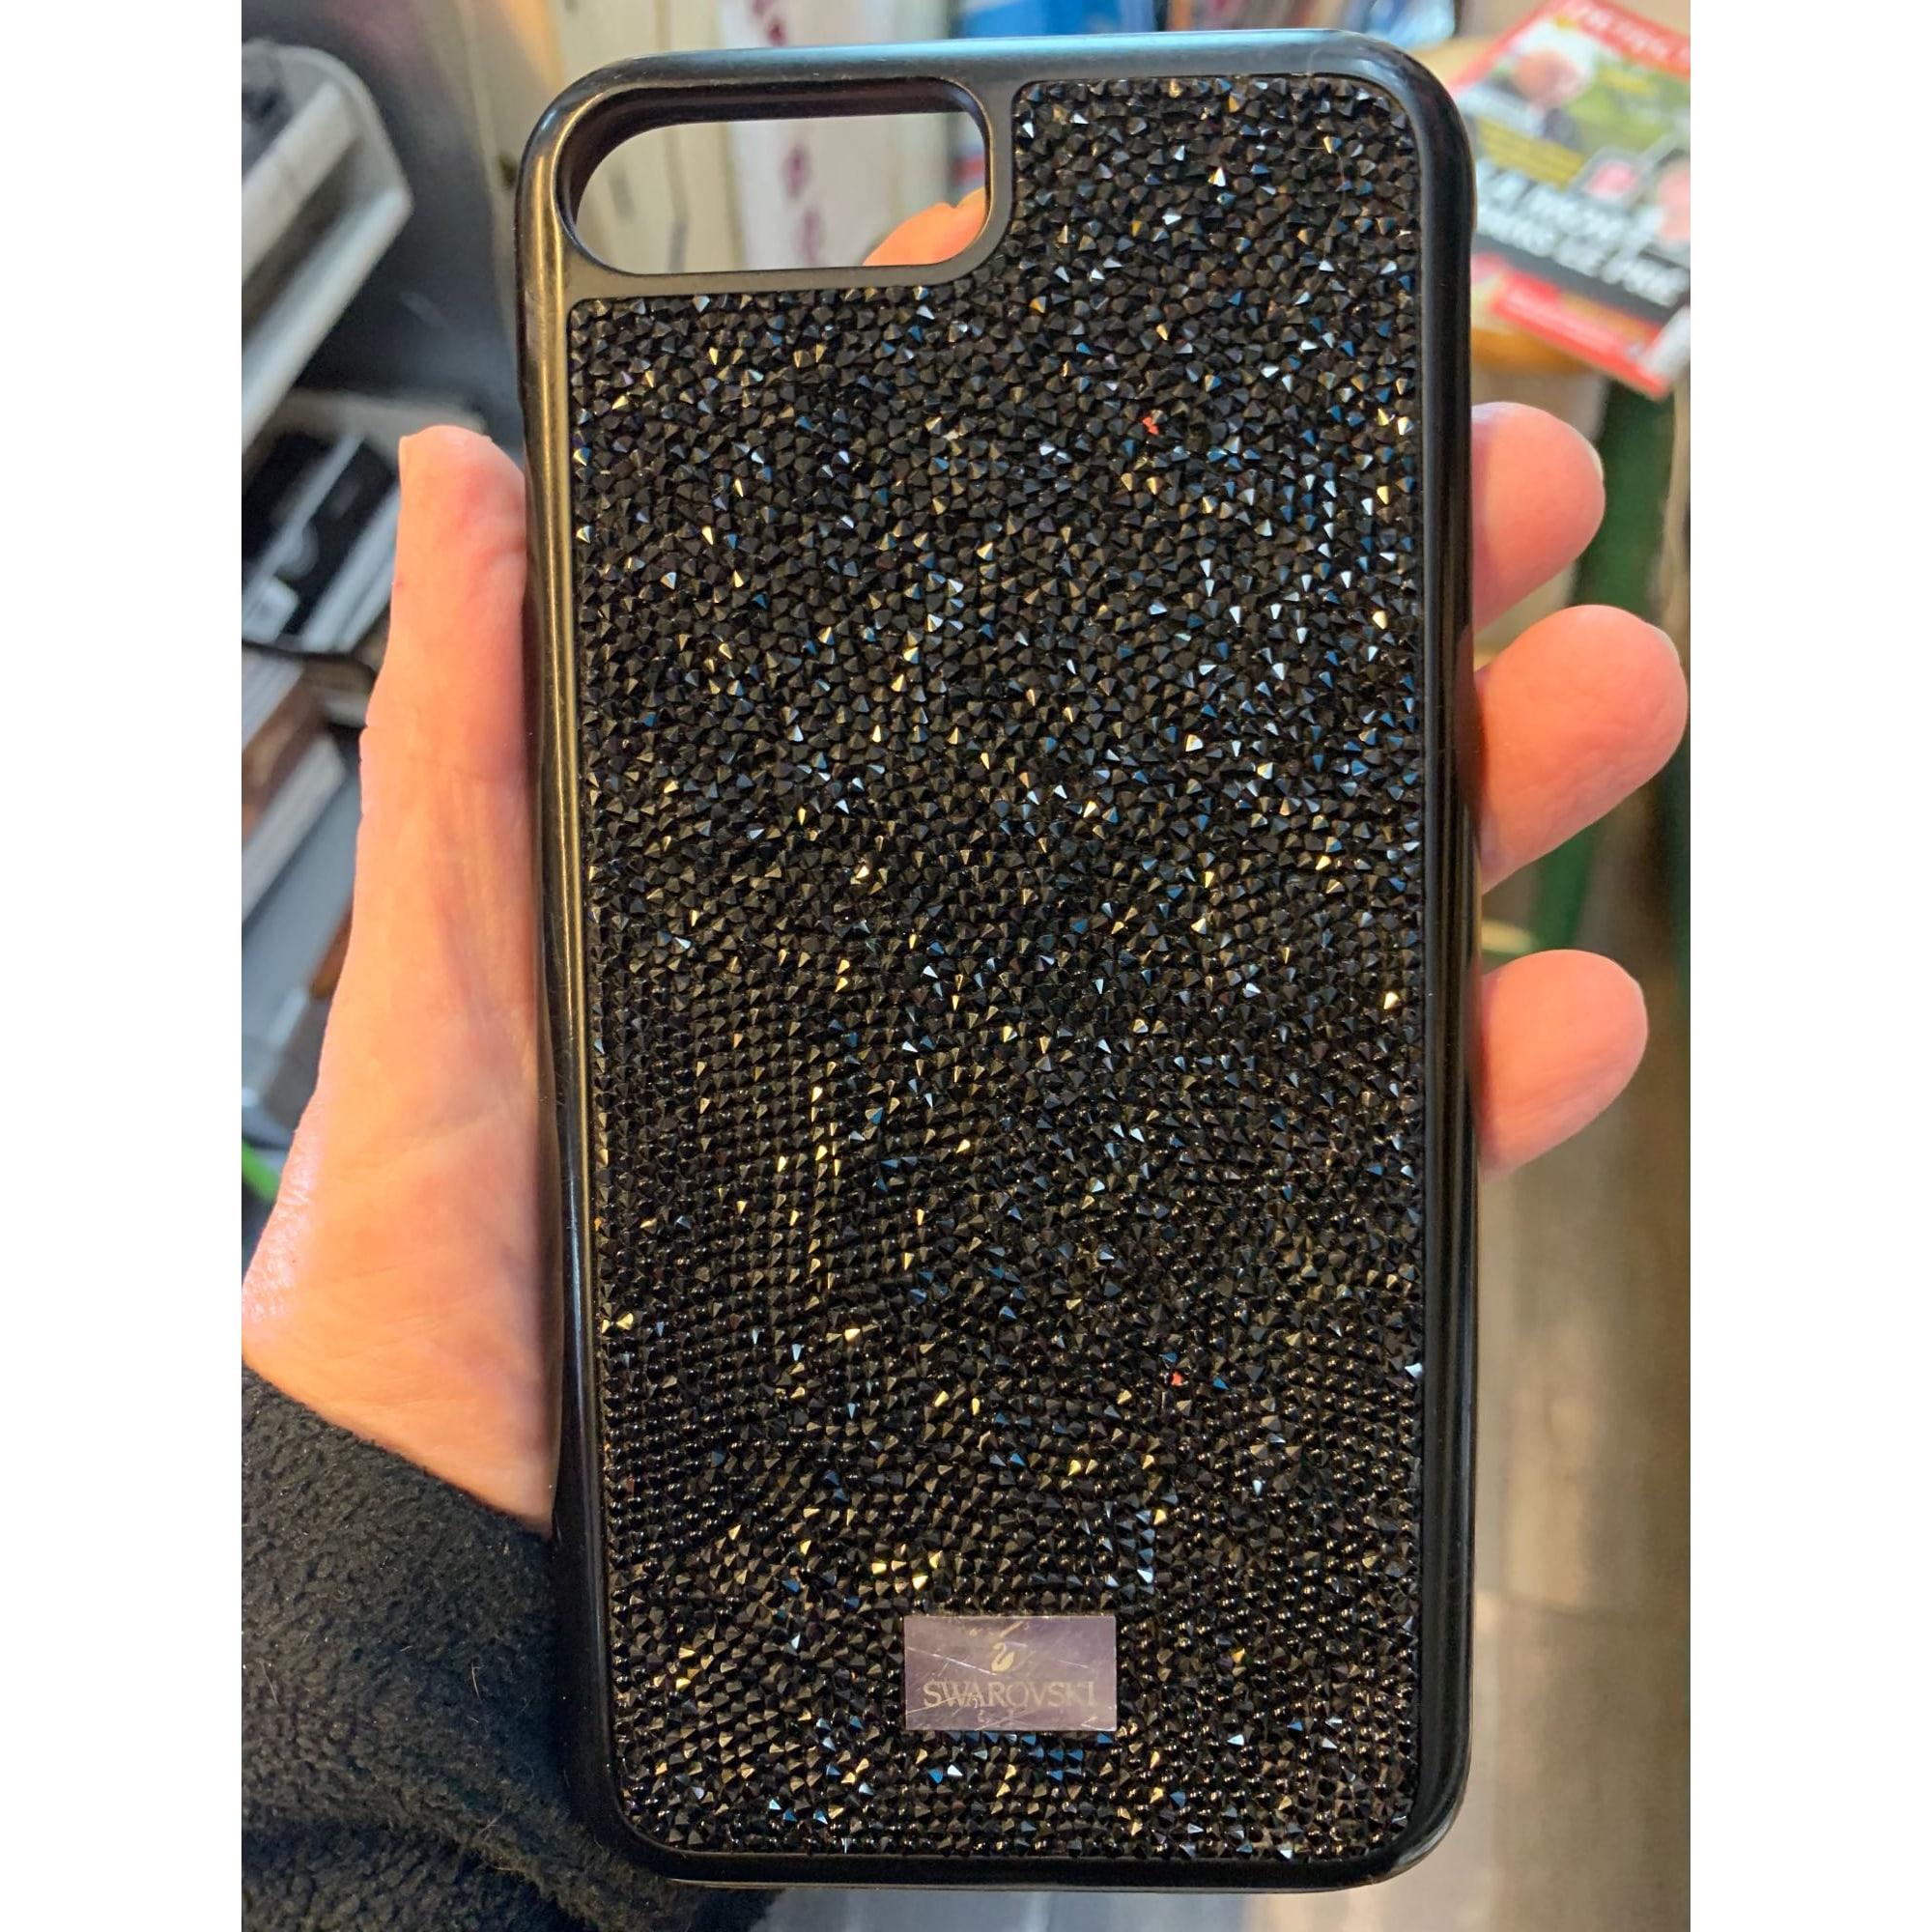 Bijou de téléphone SWAROVSKI plastique noir